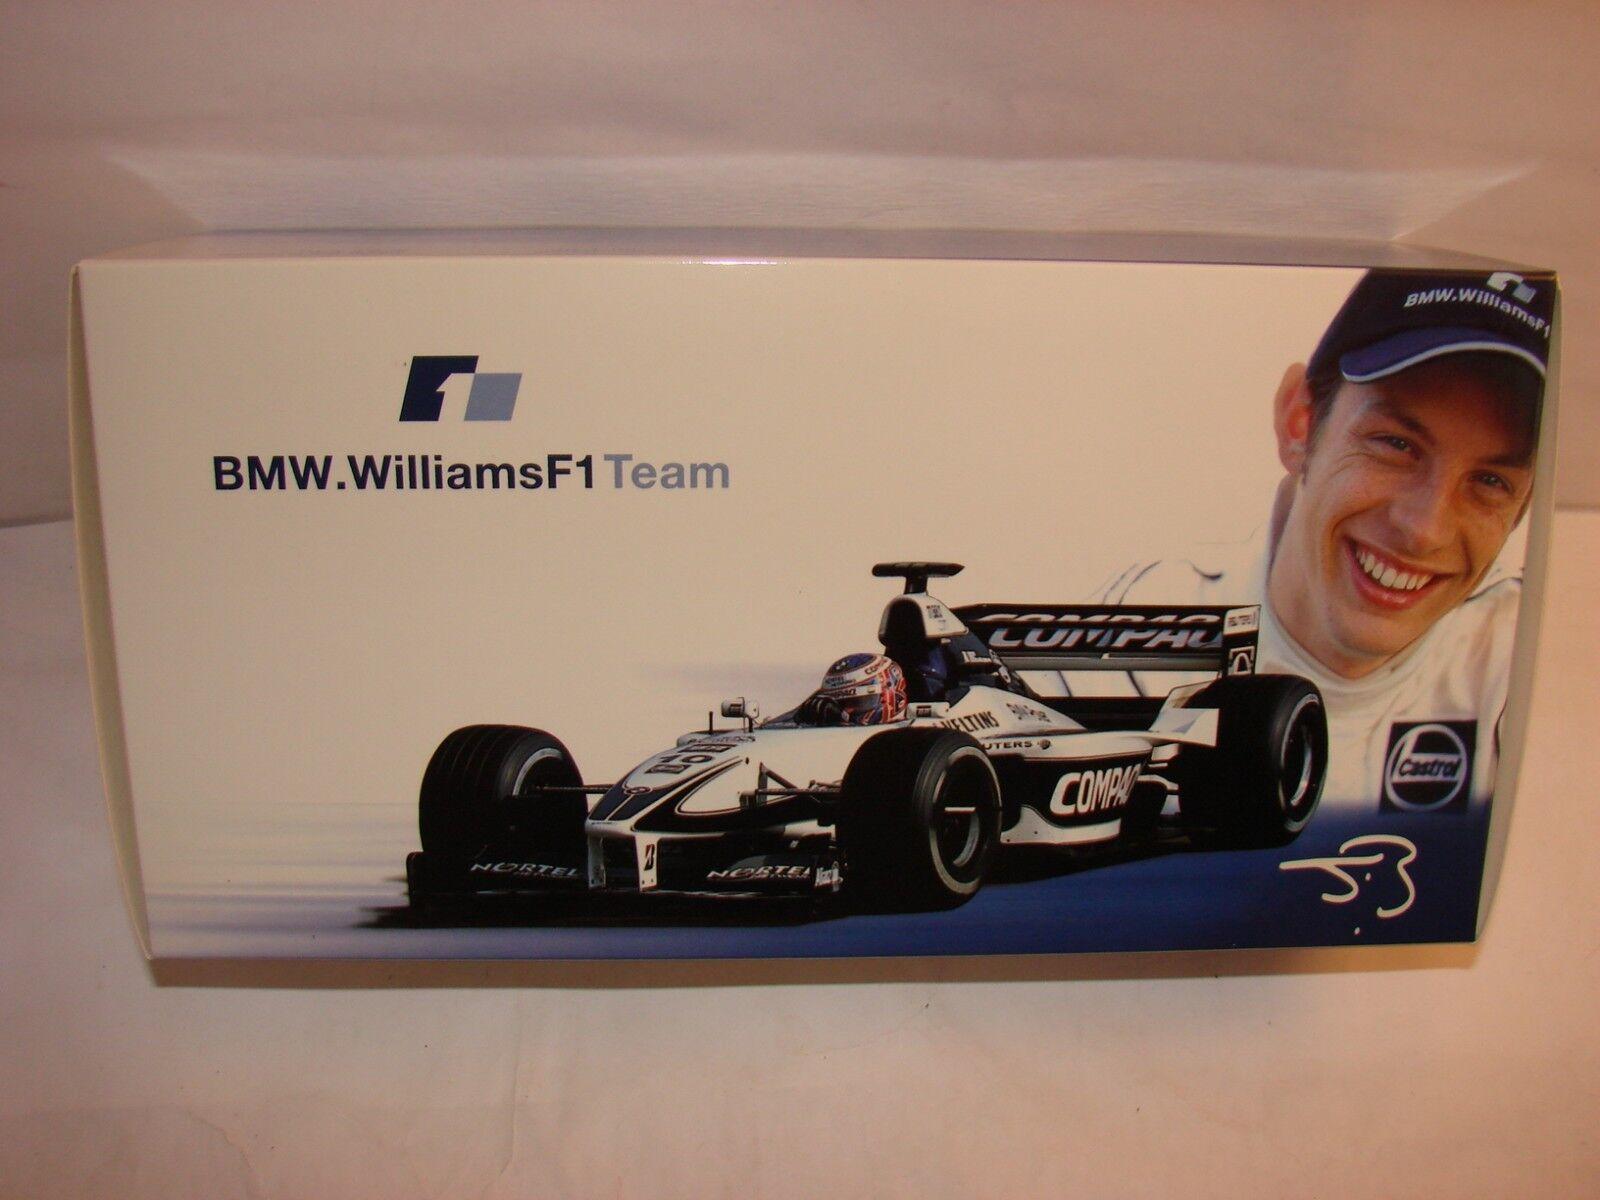 1/18 1/18 1/18 Williams BMW fw22, alliance, Jenson Button, MINICHAMPS dans neuf dans sa boîte | 2019  e2a40f